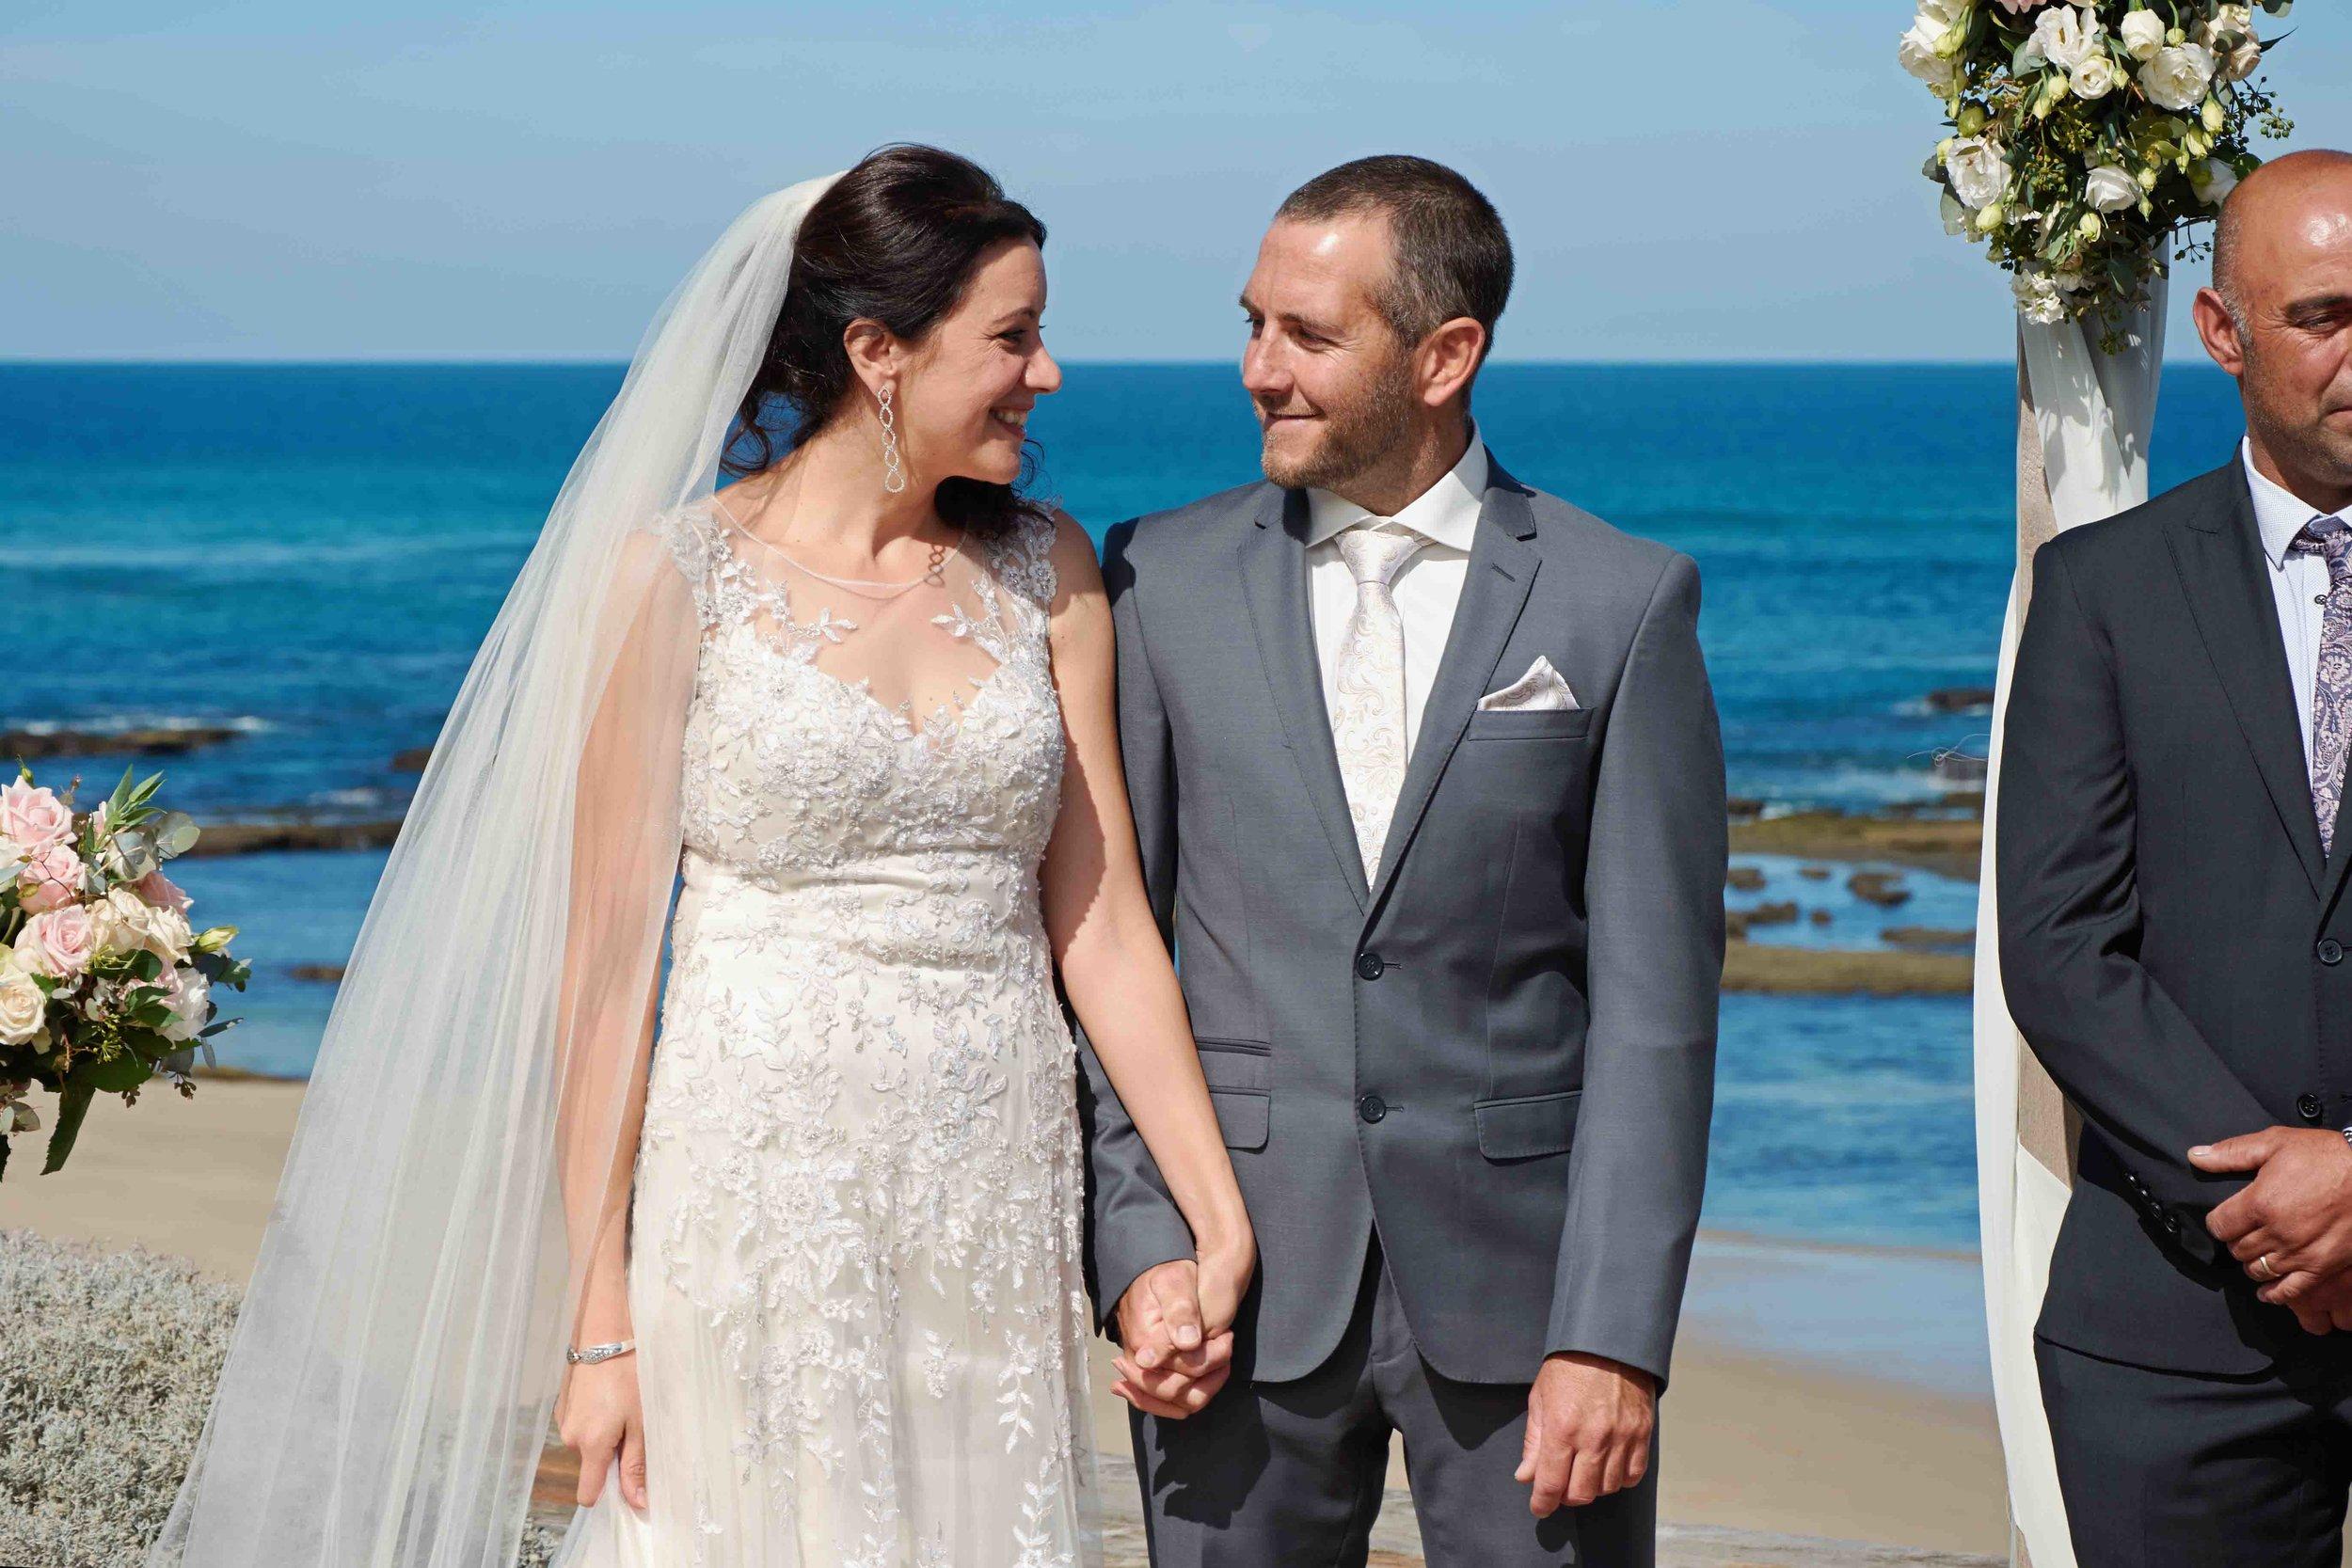 sorrento-wedding-photography-all-smiles-marissa-jade-photography-40.jpg